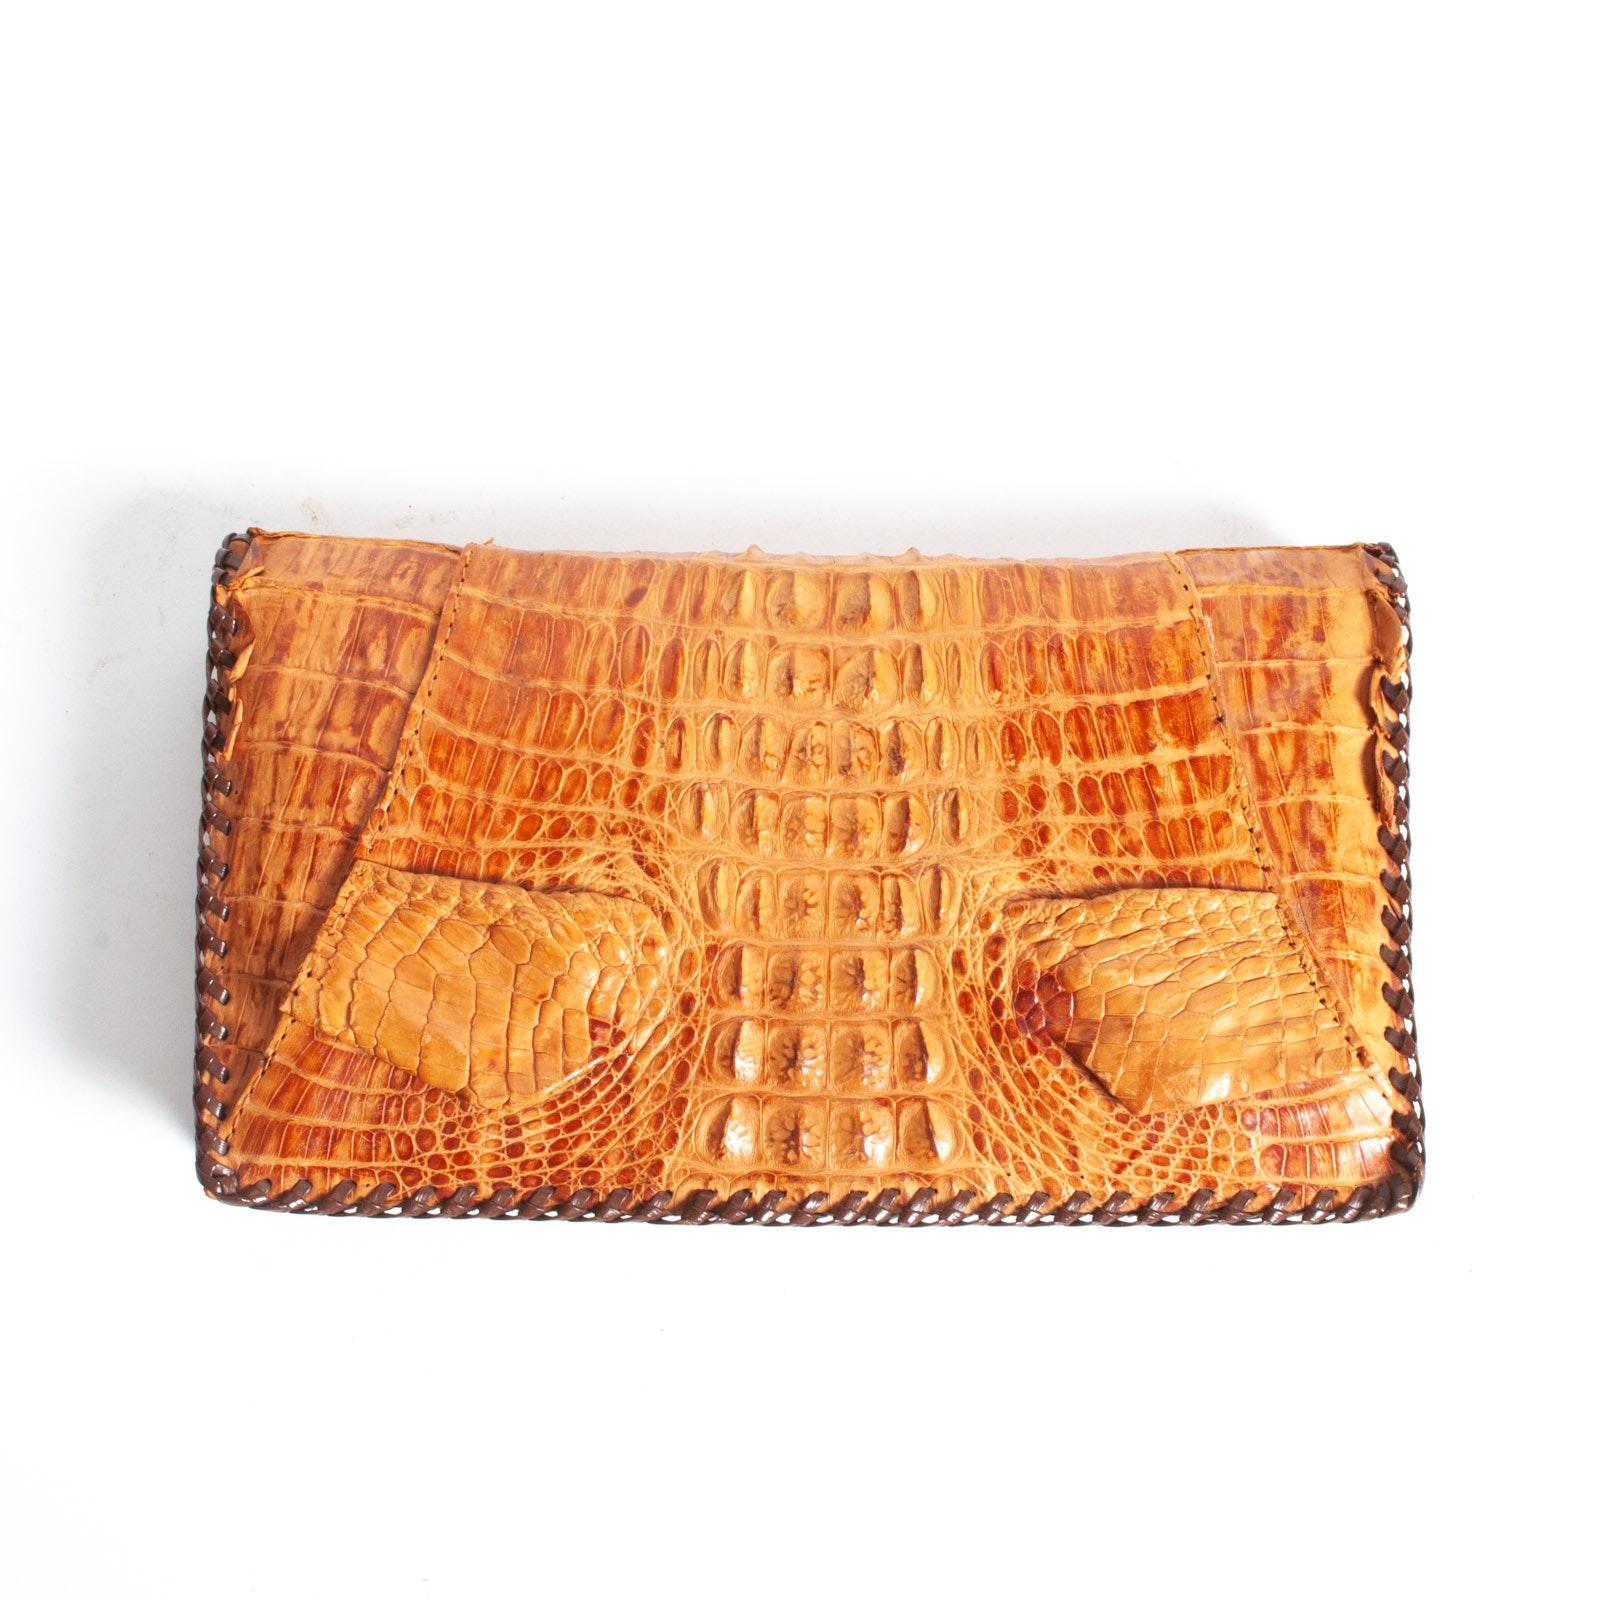 Vintage Cuban Genuine Alligator Skin Leather Clutch